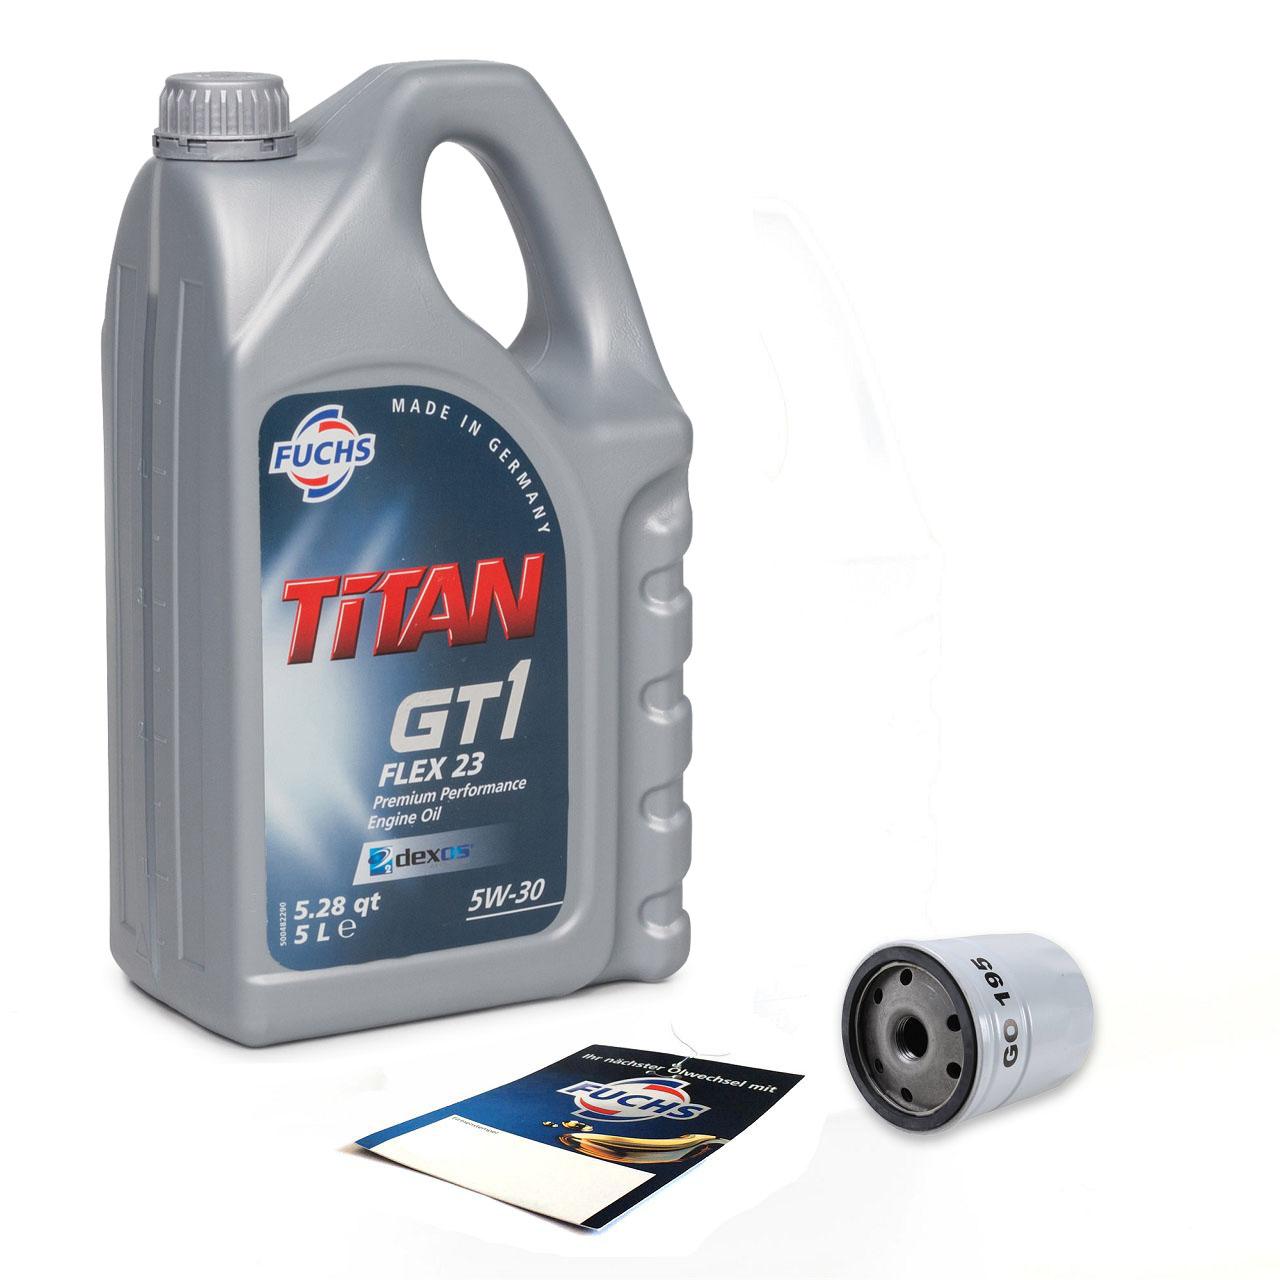 FUCHS Motoröl 5W30 5L dexos2 + Ölfilter 650104 für ASTRA G/H VECTRA B/C ZAFIRA A